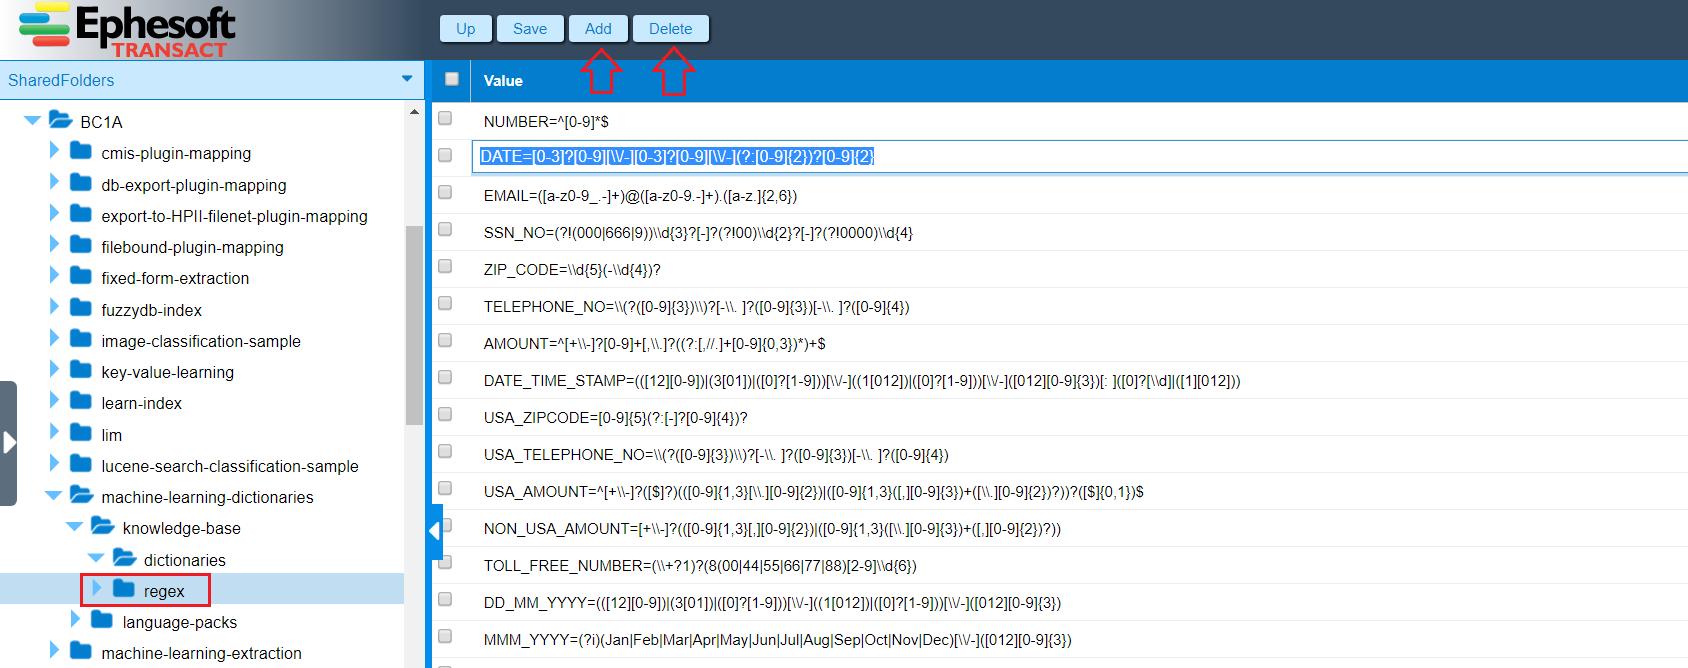 C:\Users\Ephesoft\AppData\Local\Microsoft\Windows\INetCache\Content.Word\28.png